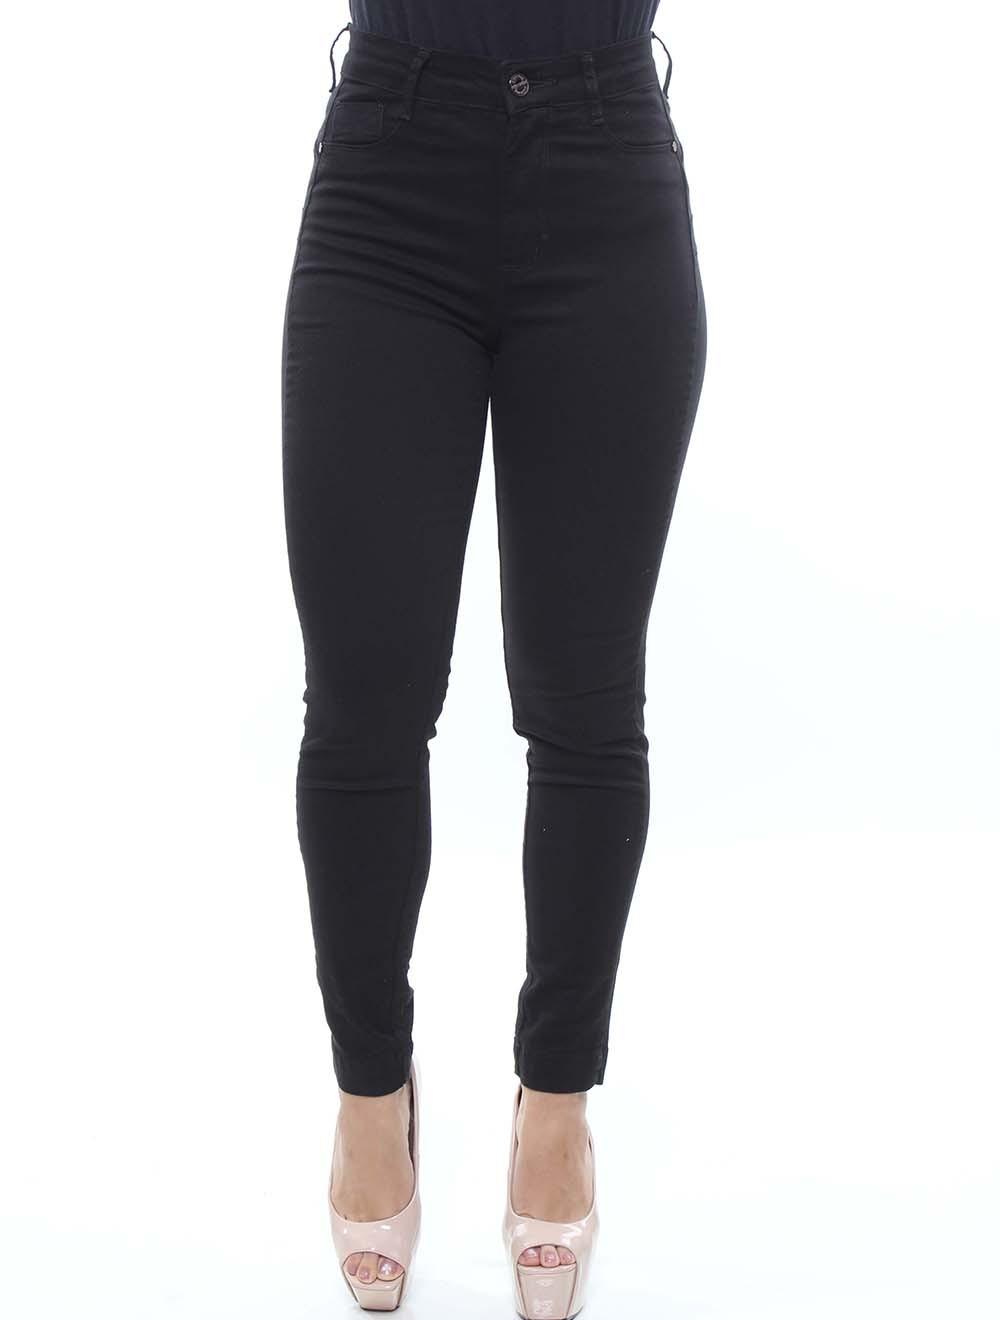 Calça Jeans Feminina Sarja Preta Skinny Crocker - 47773